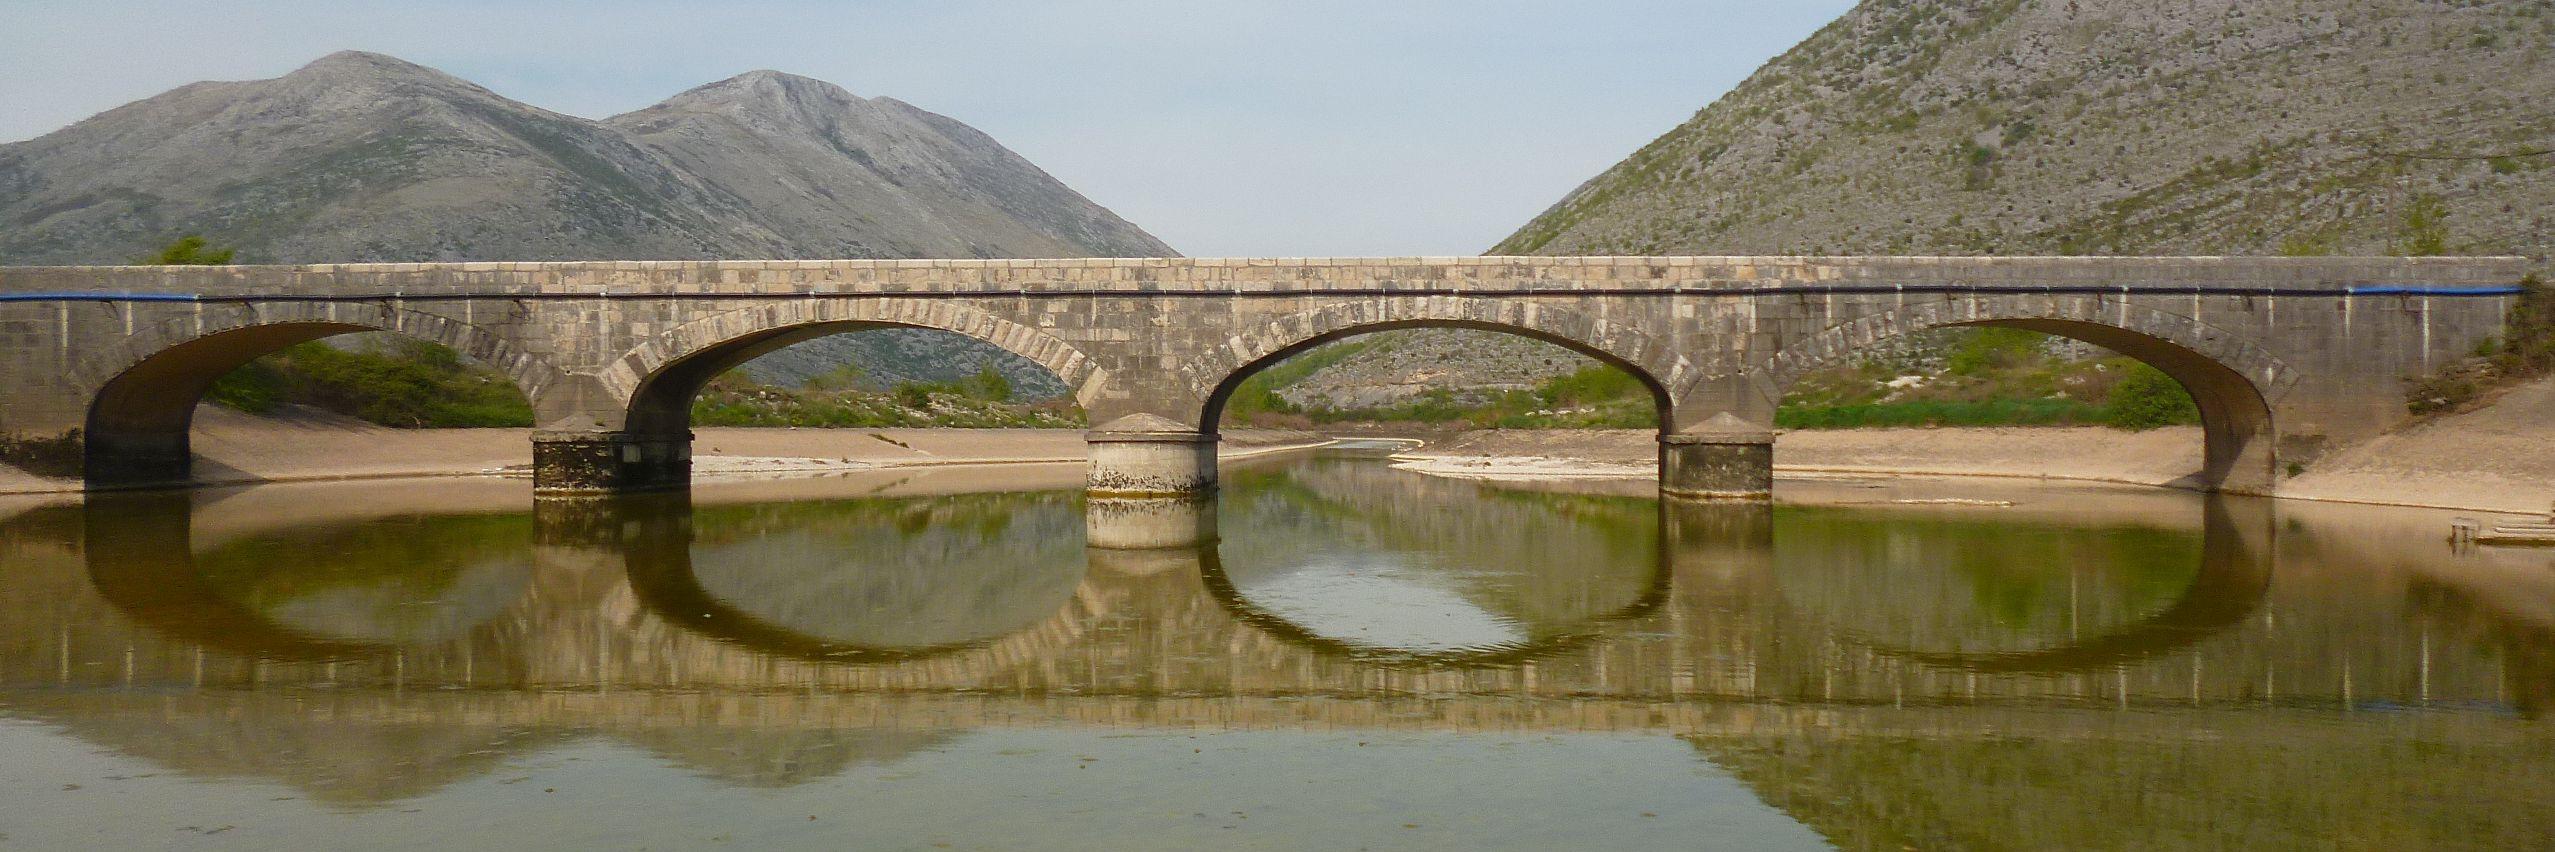 Мост на Поповом поле